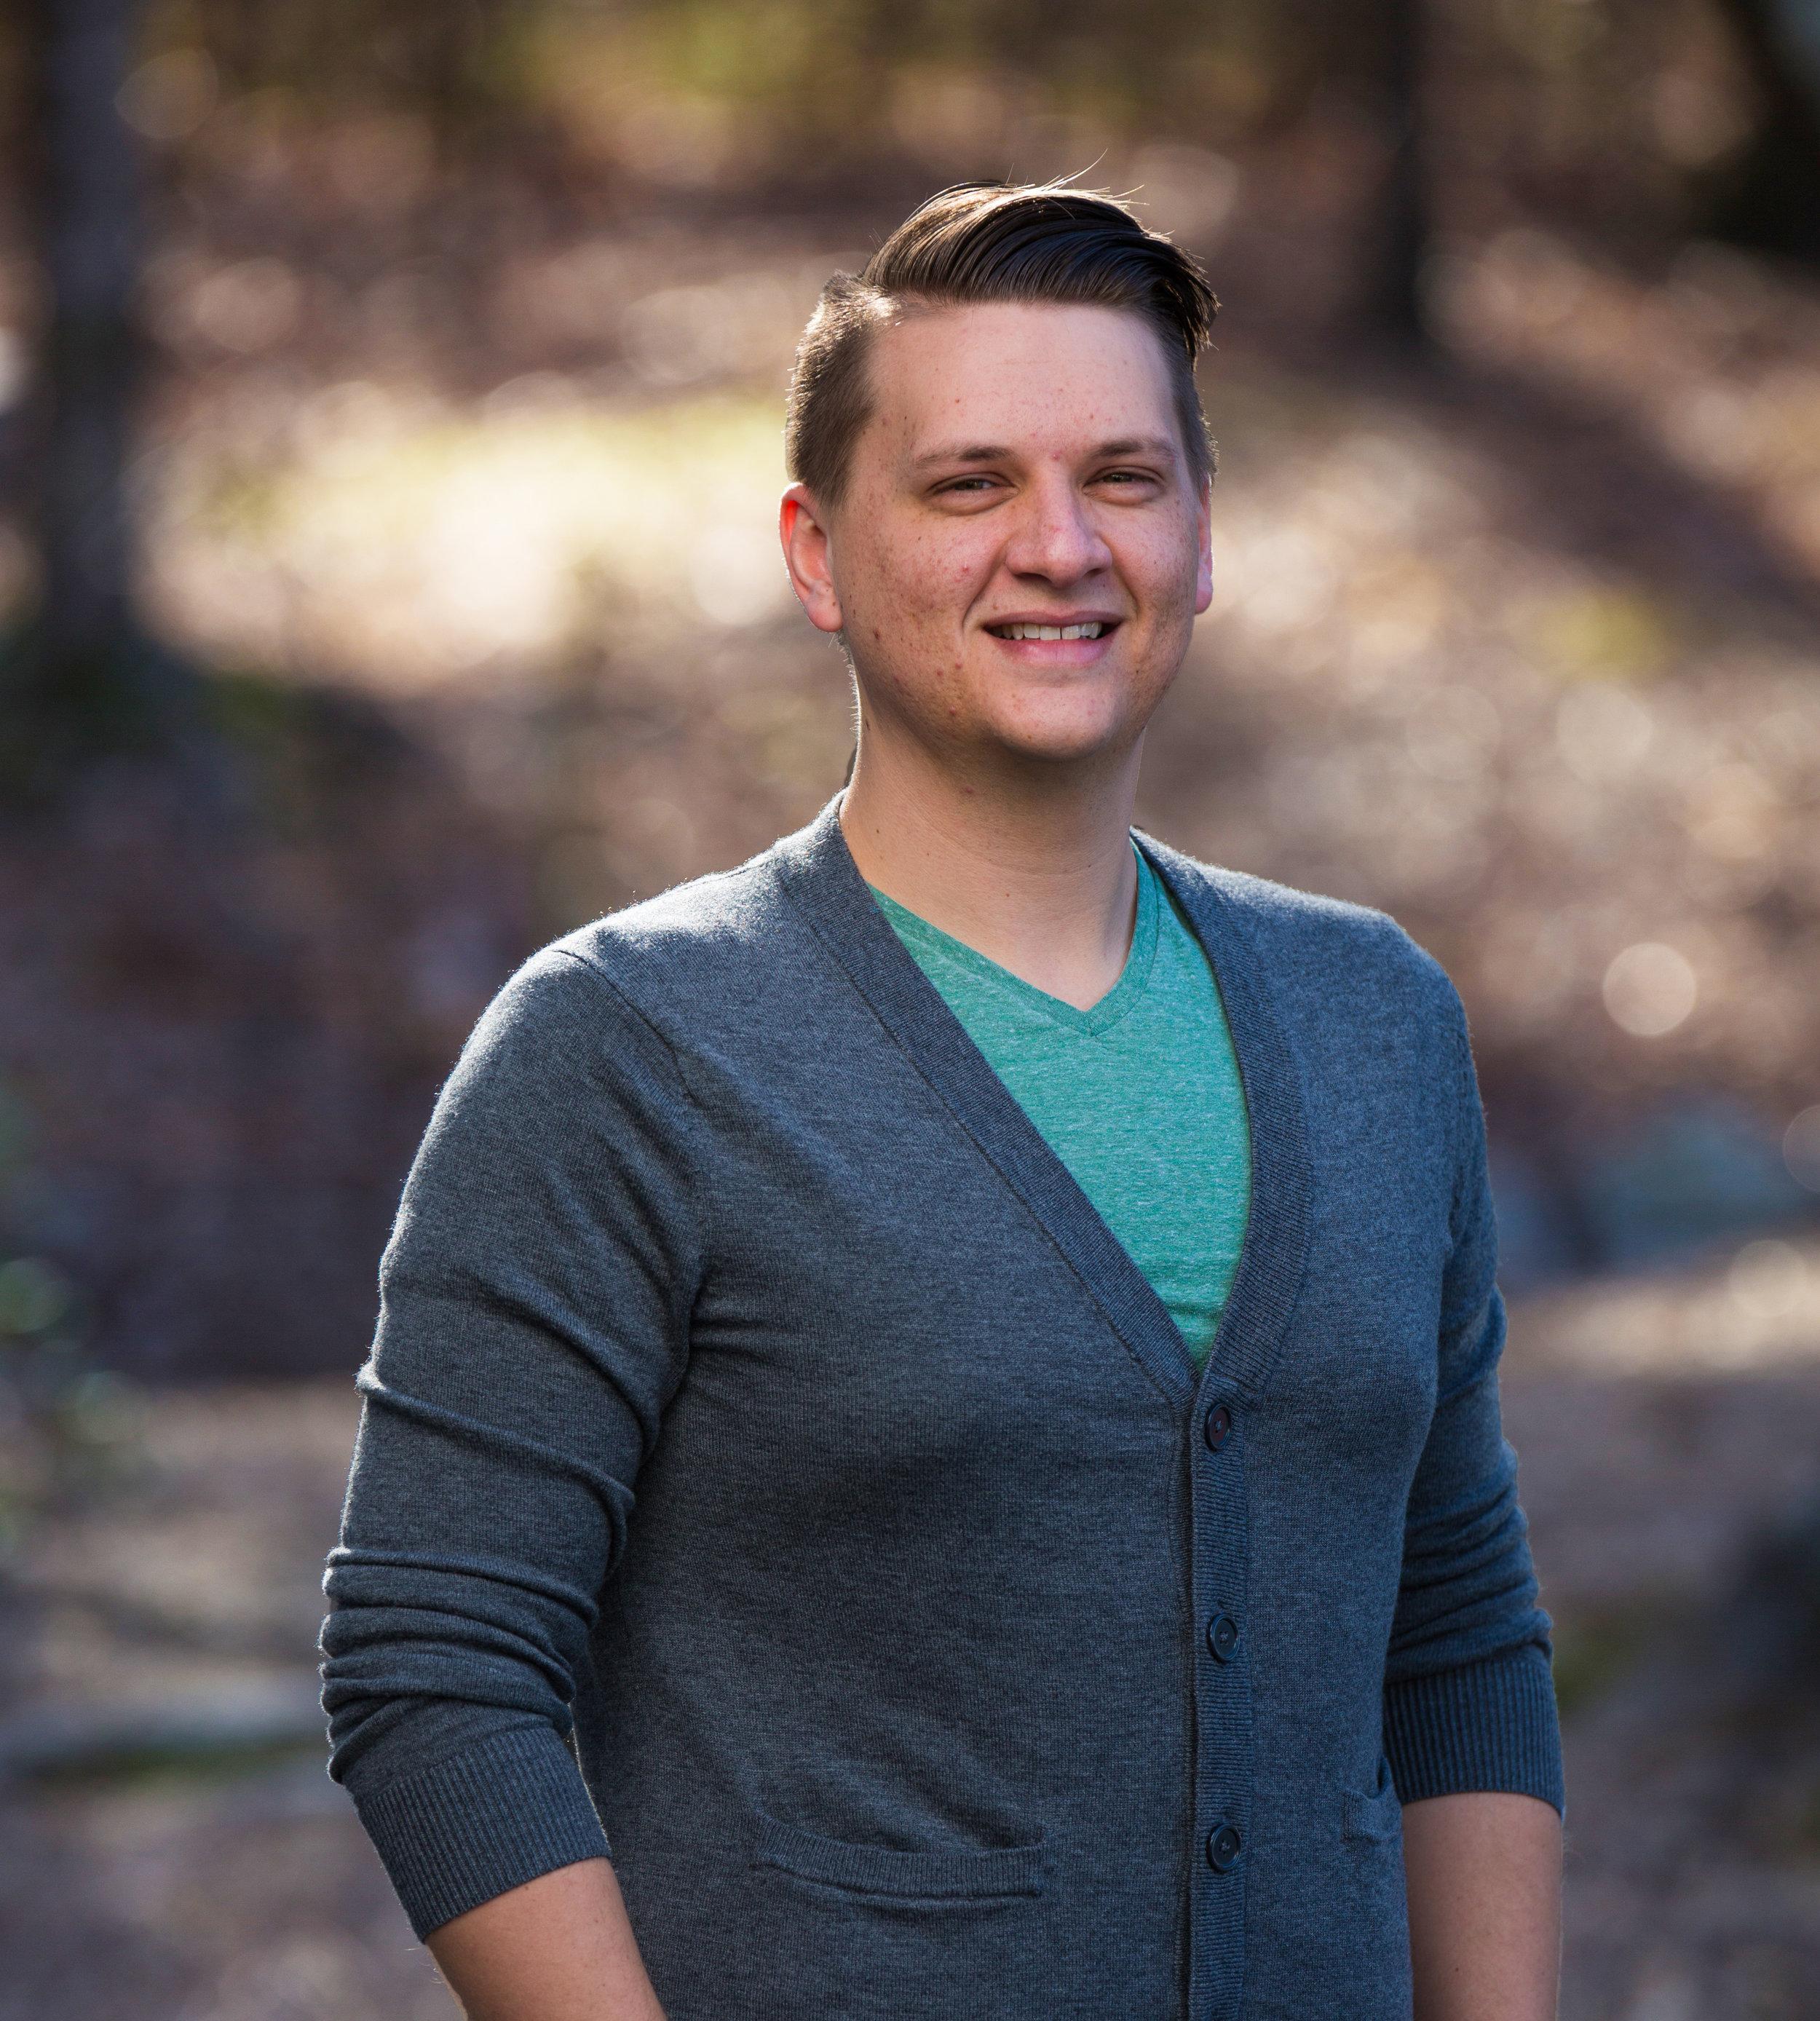 Michael Dresselhaus Community Director